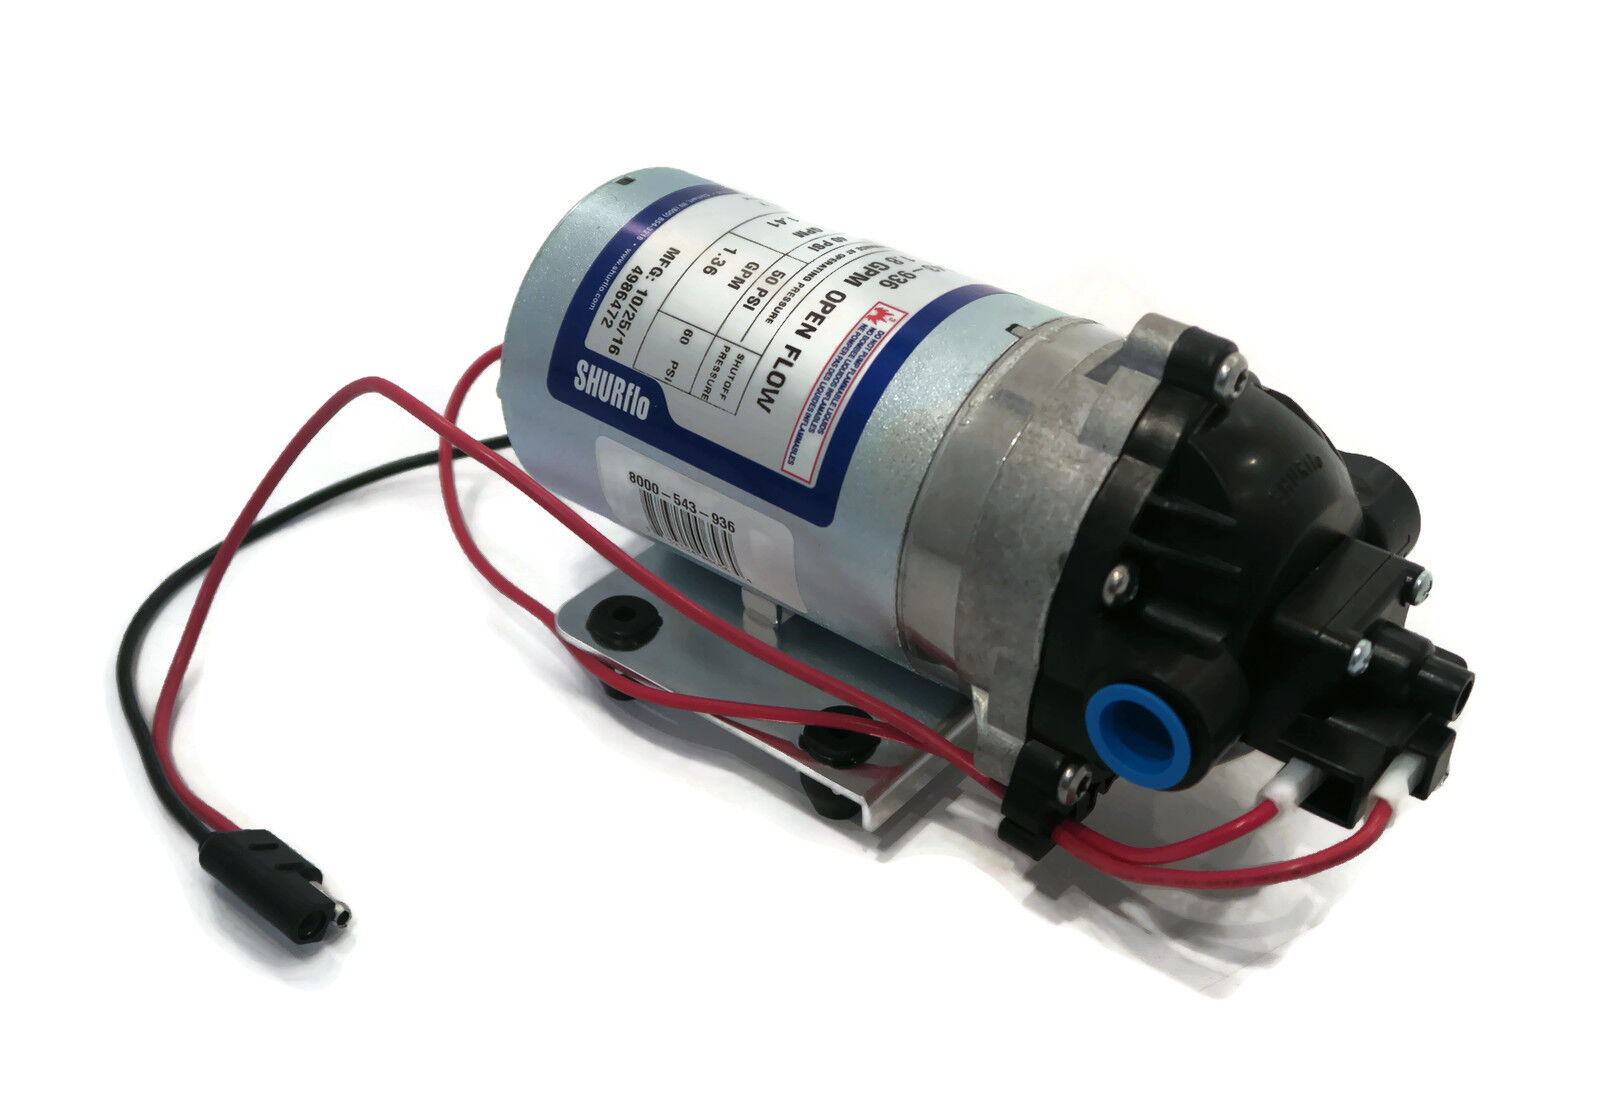 Shurflo 12v Volt Demand Water Pump W Wiring Harness Lawn Yard Chemical Sprayer